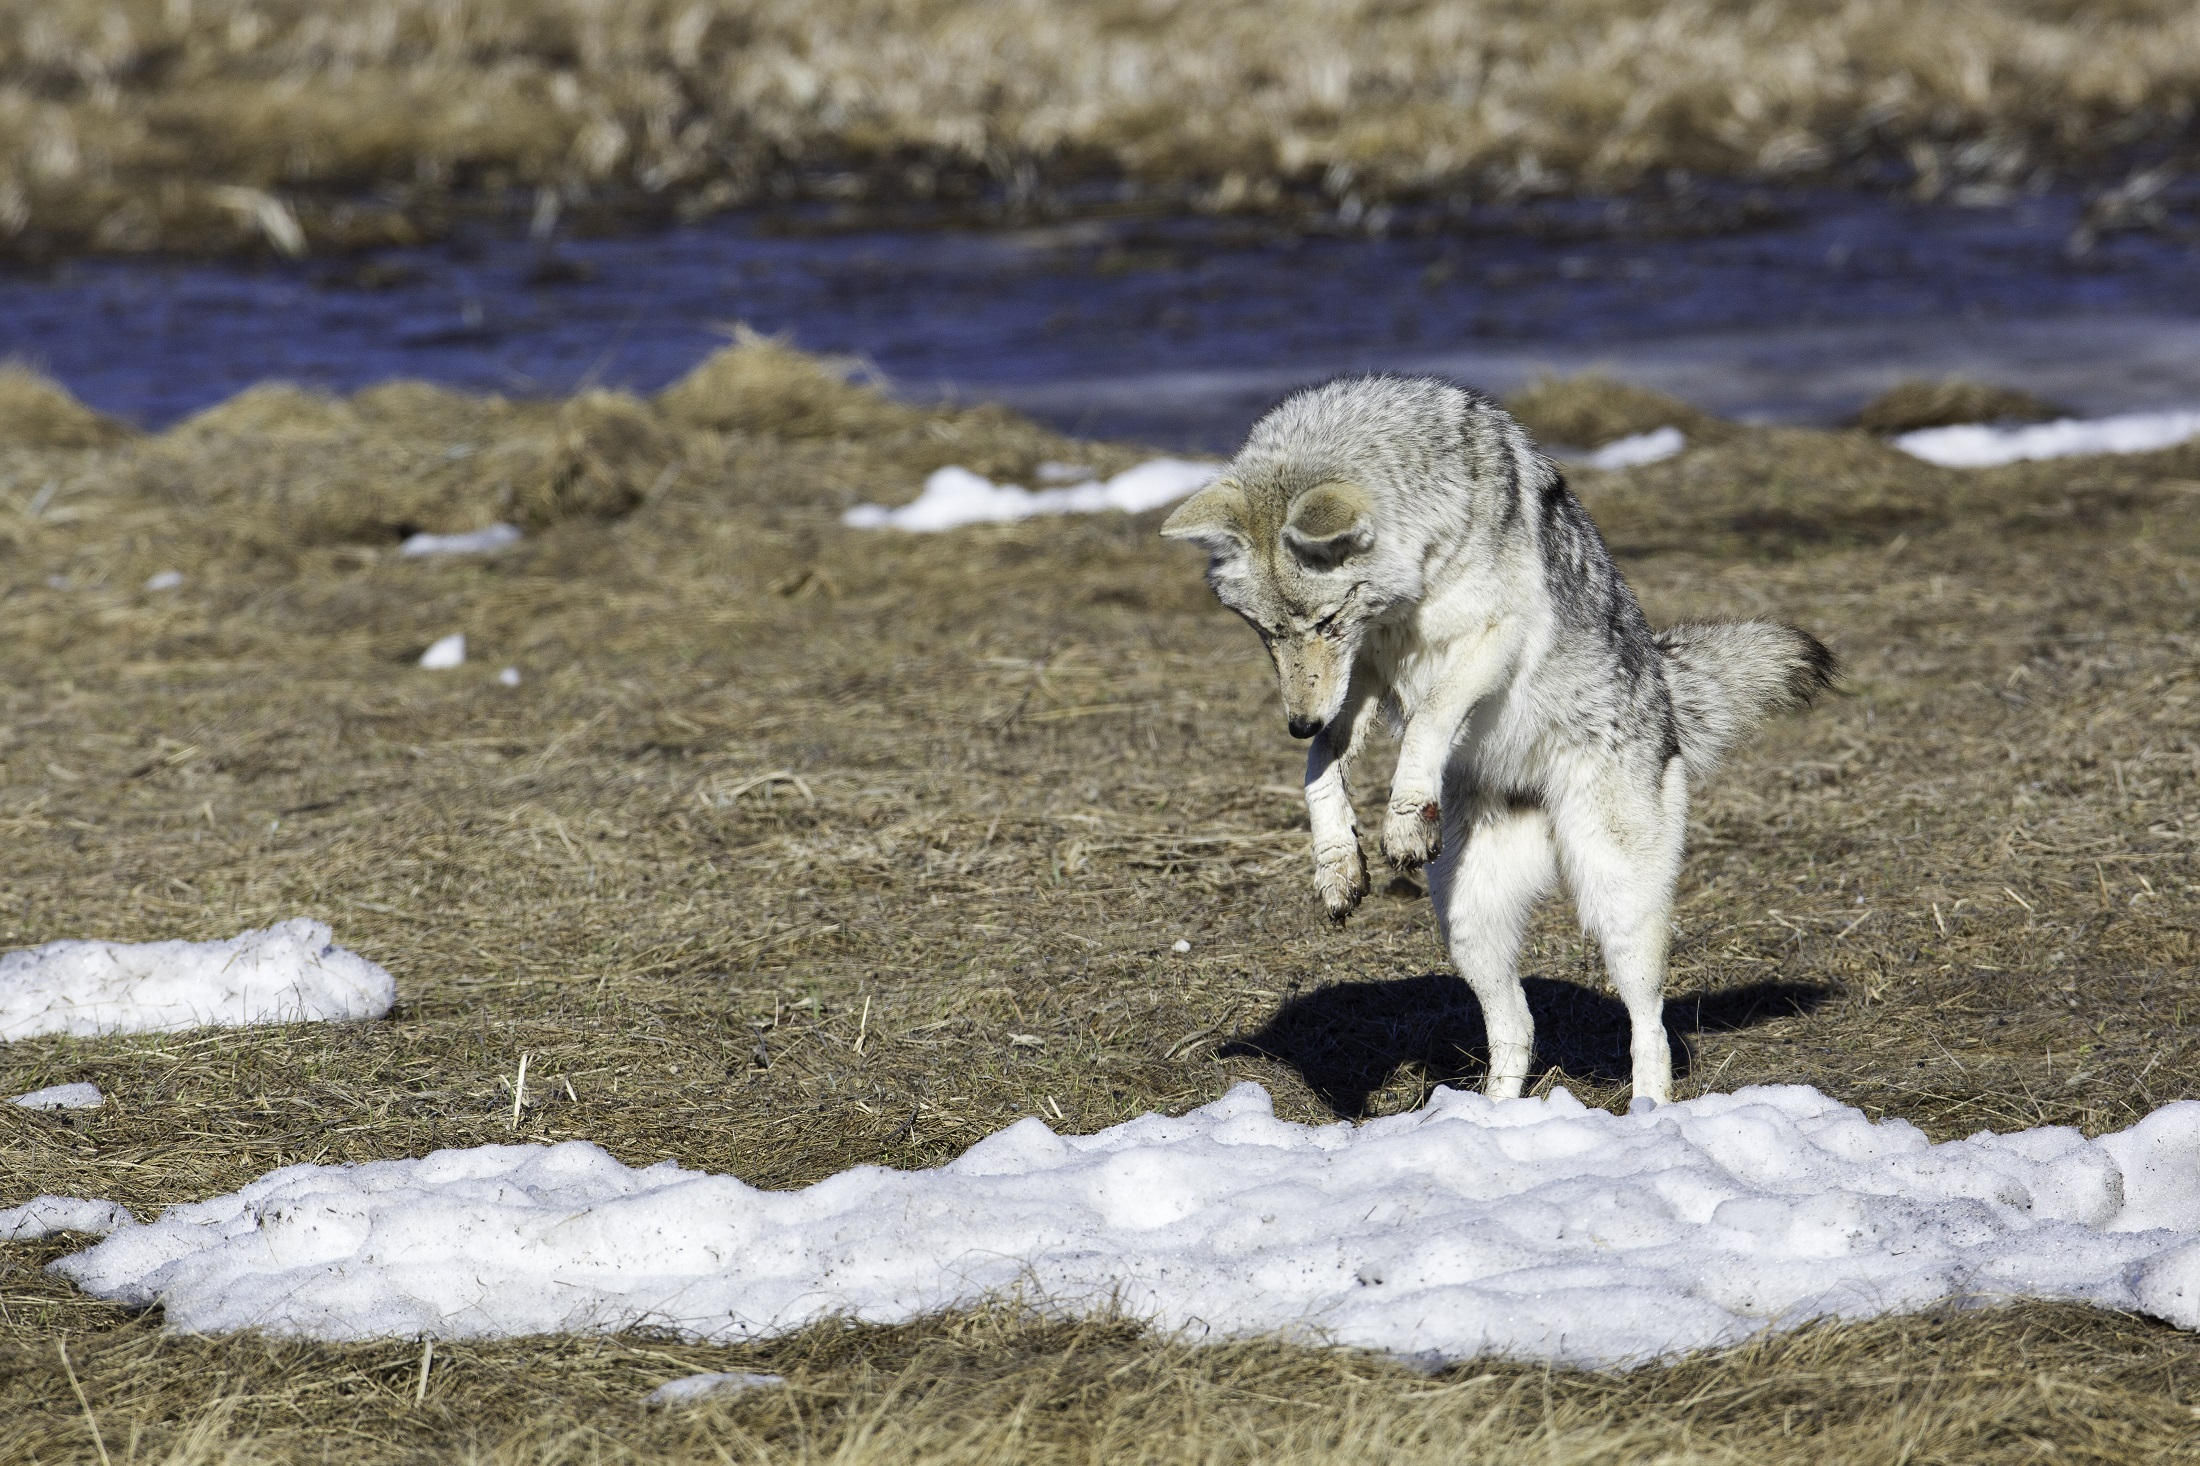 coyote-dancing on prey